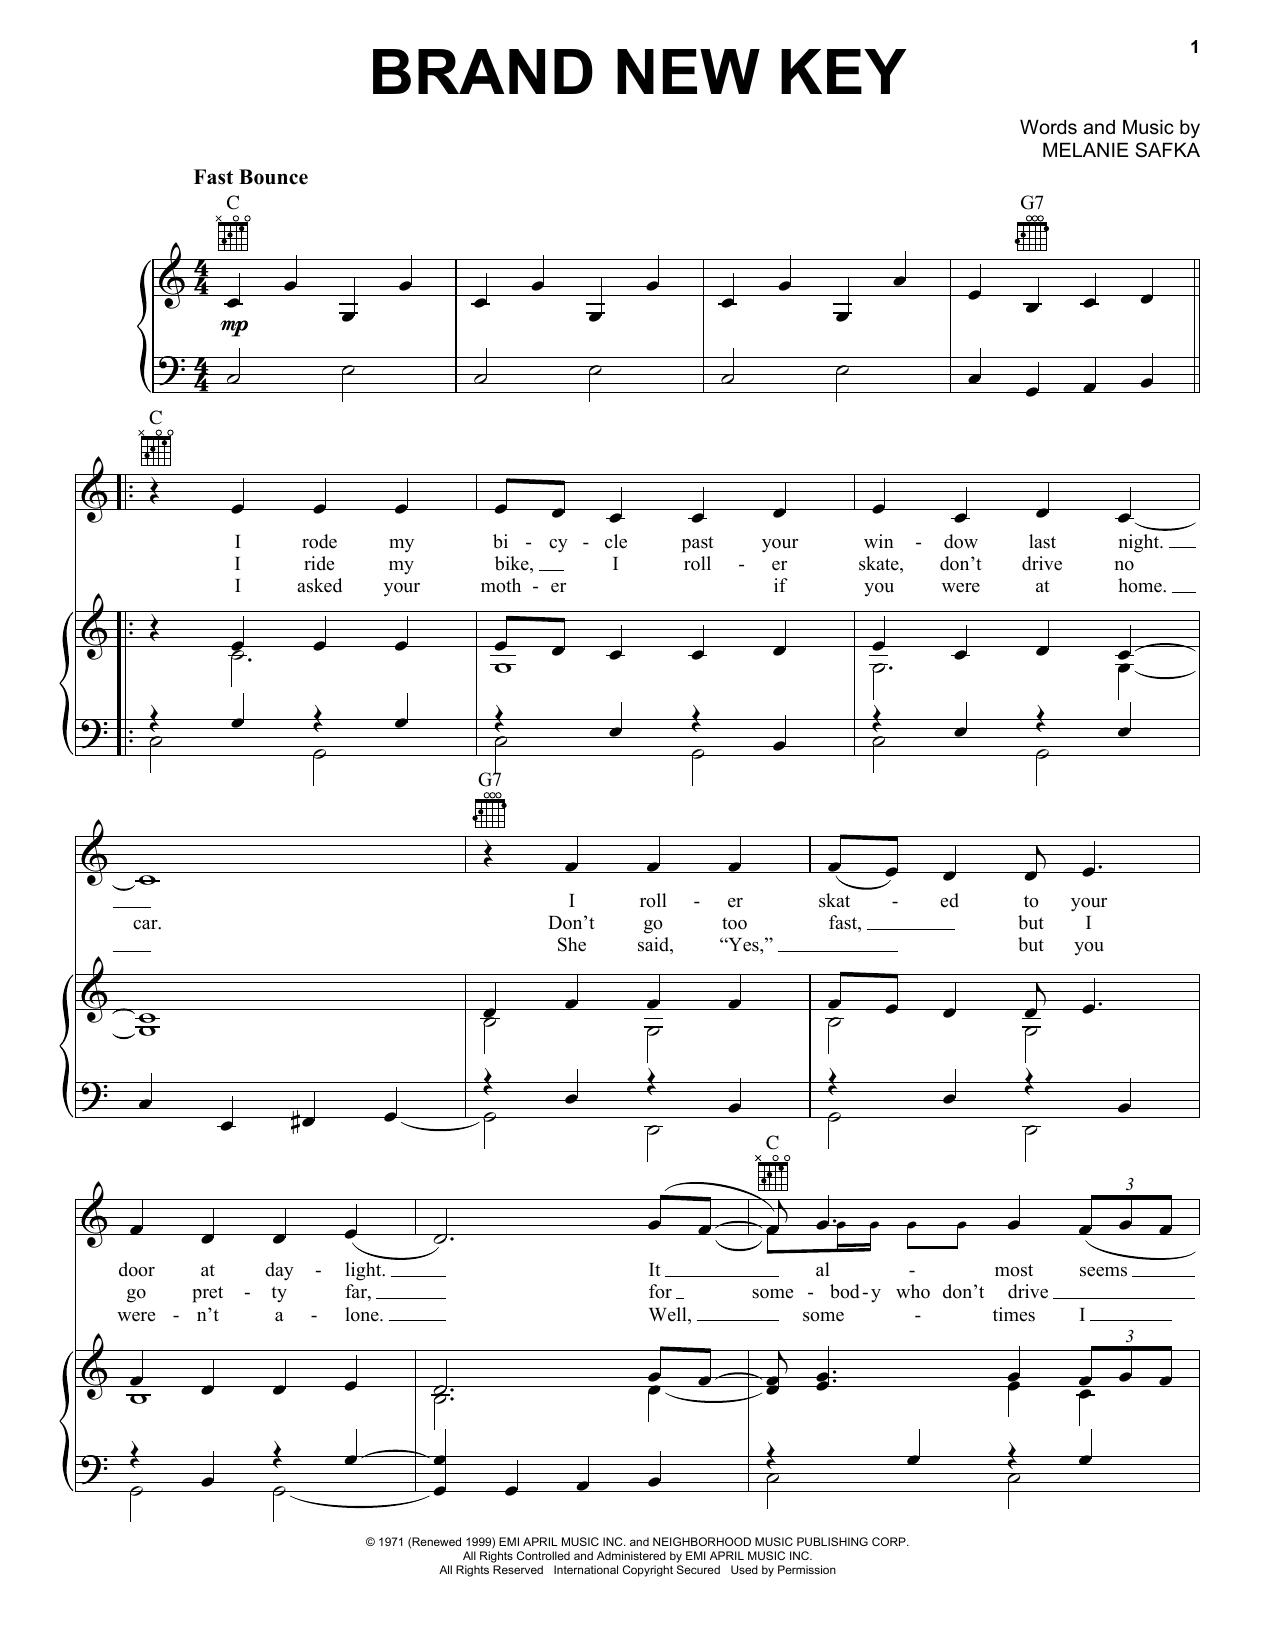 Melanie Brand New Key sheet music notes and chords. Download Printable PDF.